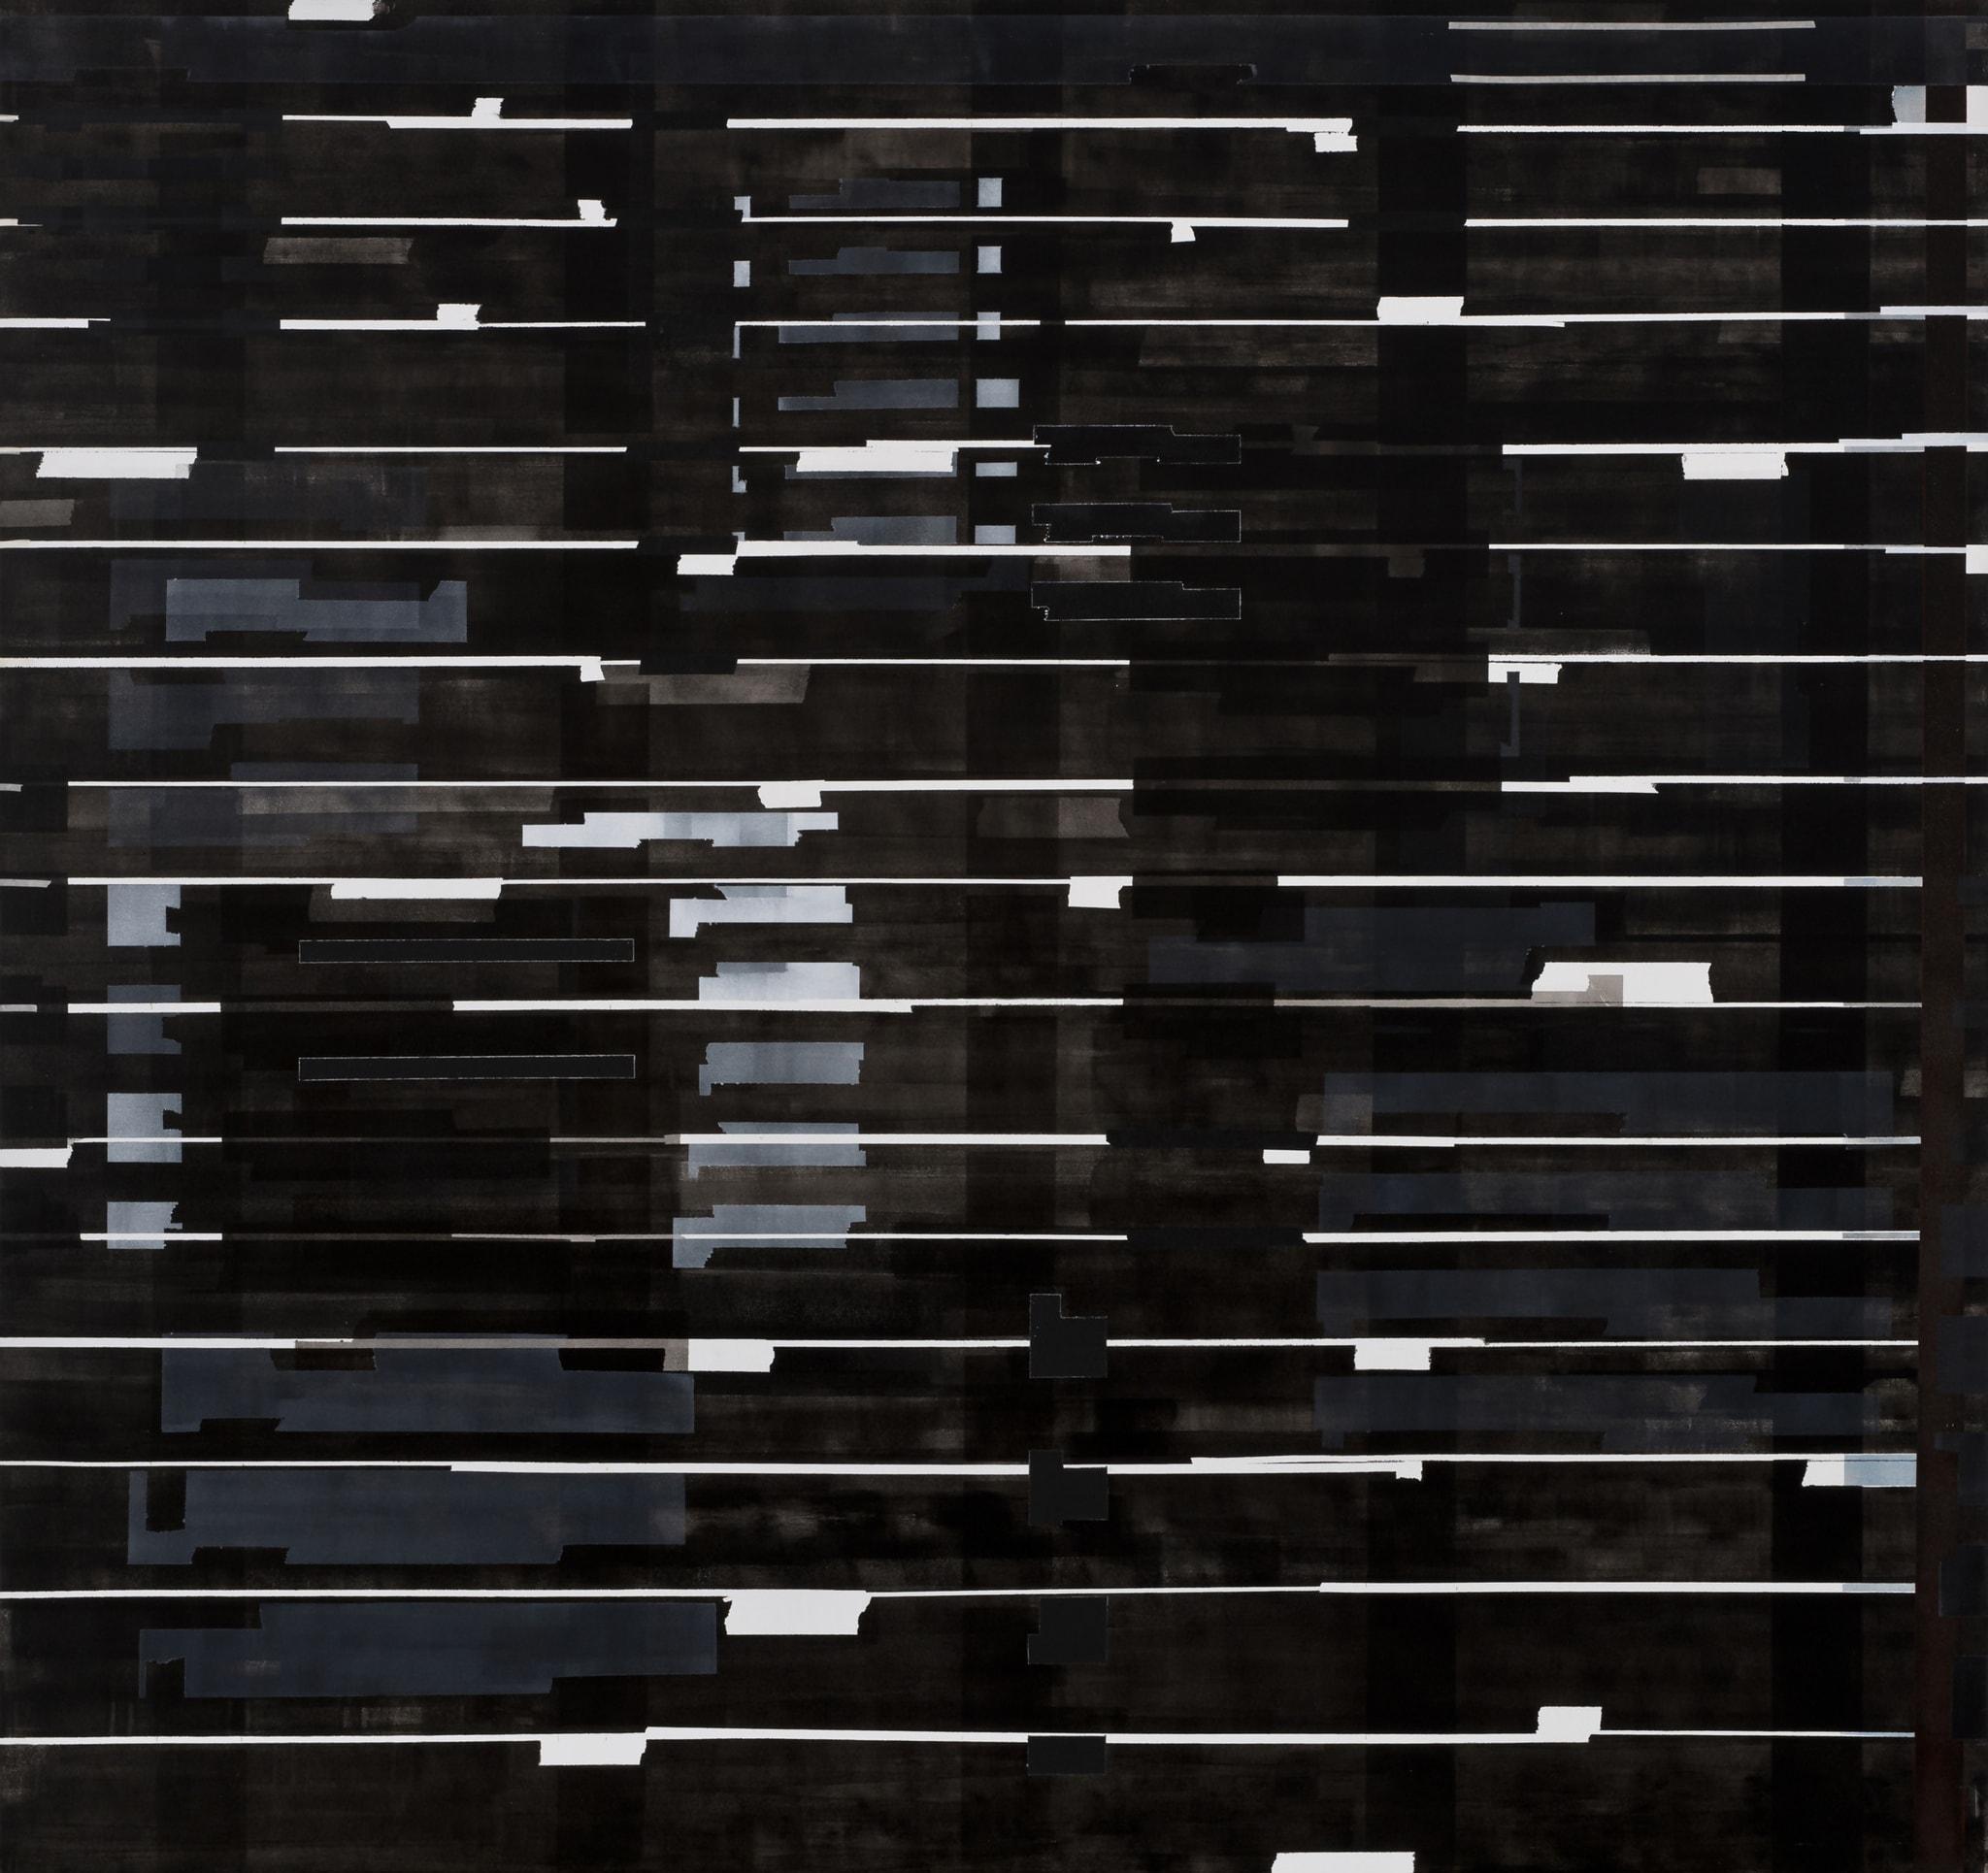 Monochrome City, 2014 by Nuri Kuzucan